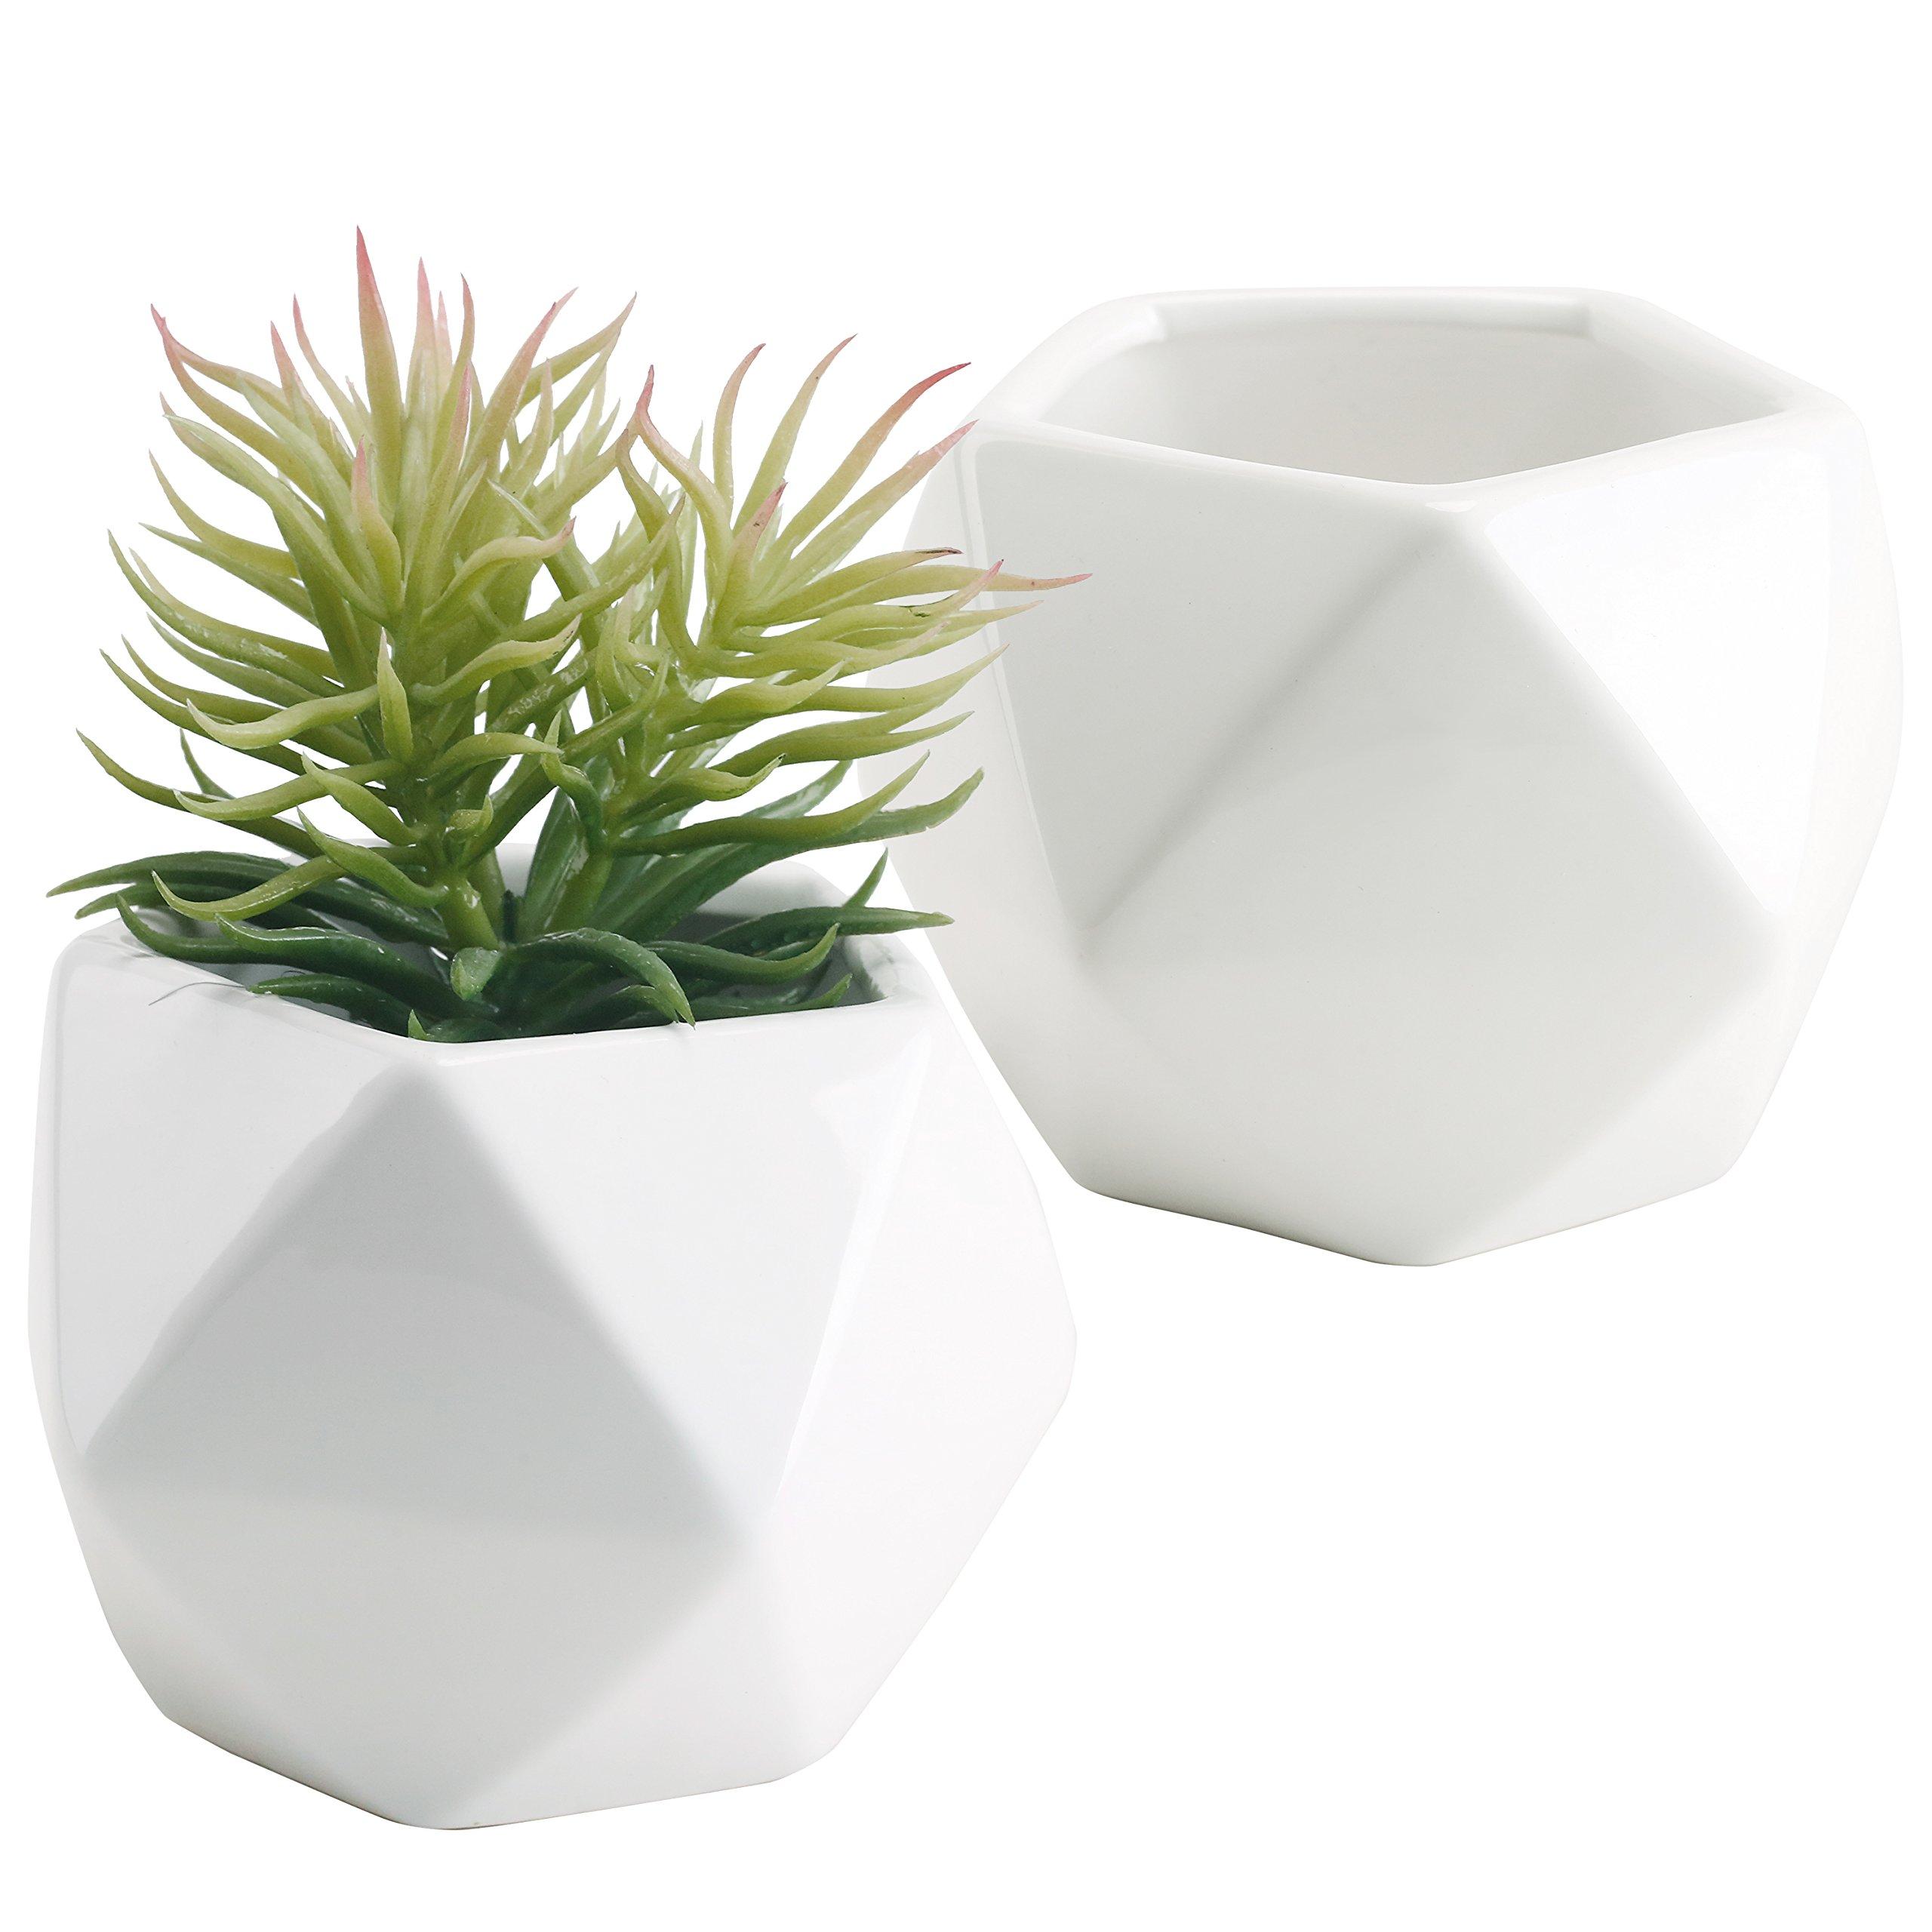 Set of 2 White Ceramic Geometric Design Mini Succulent Planter Pots, 5 Inches